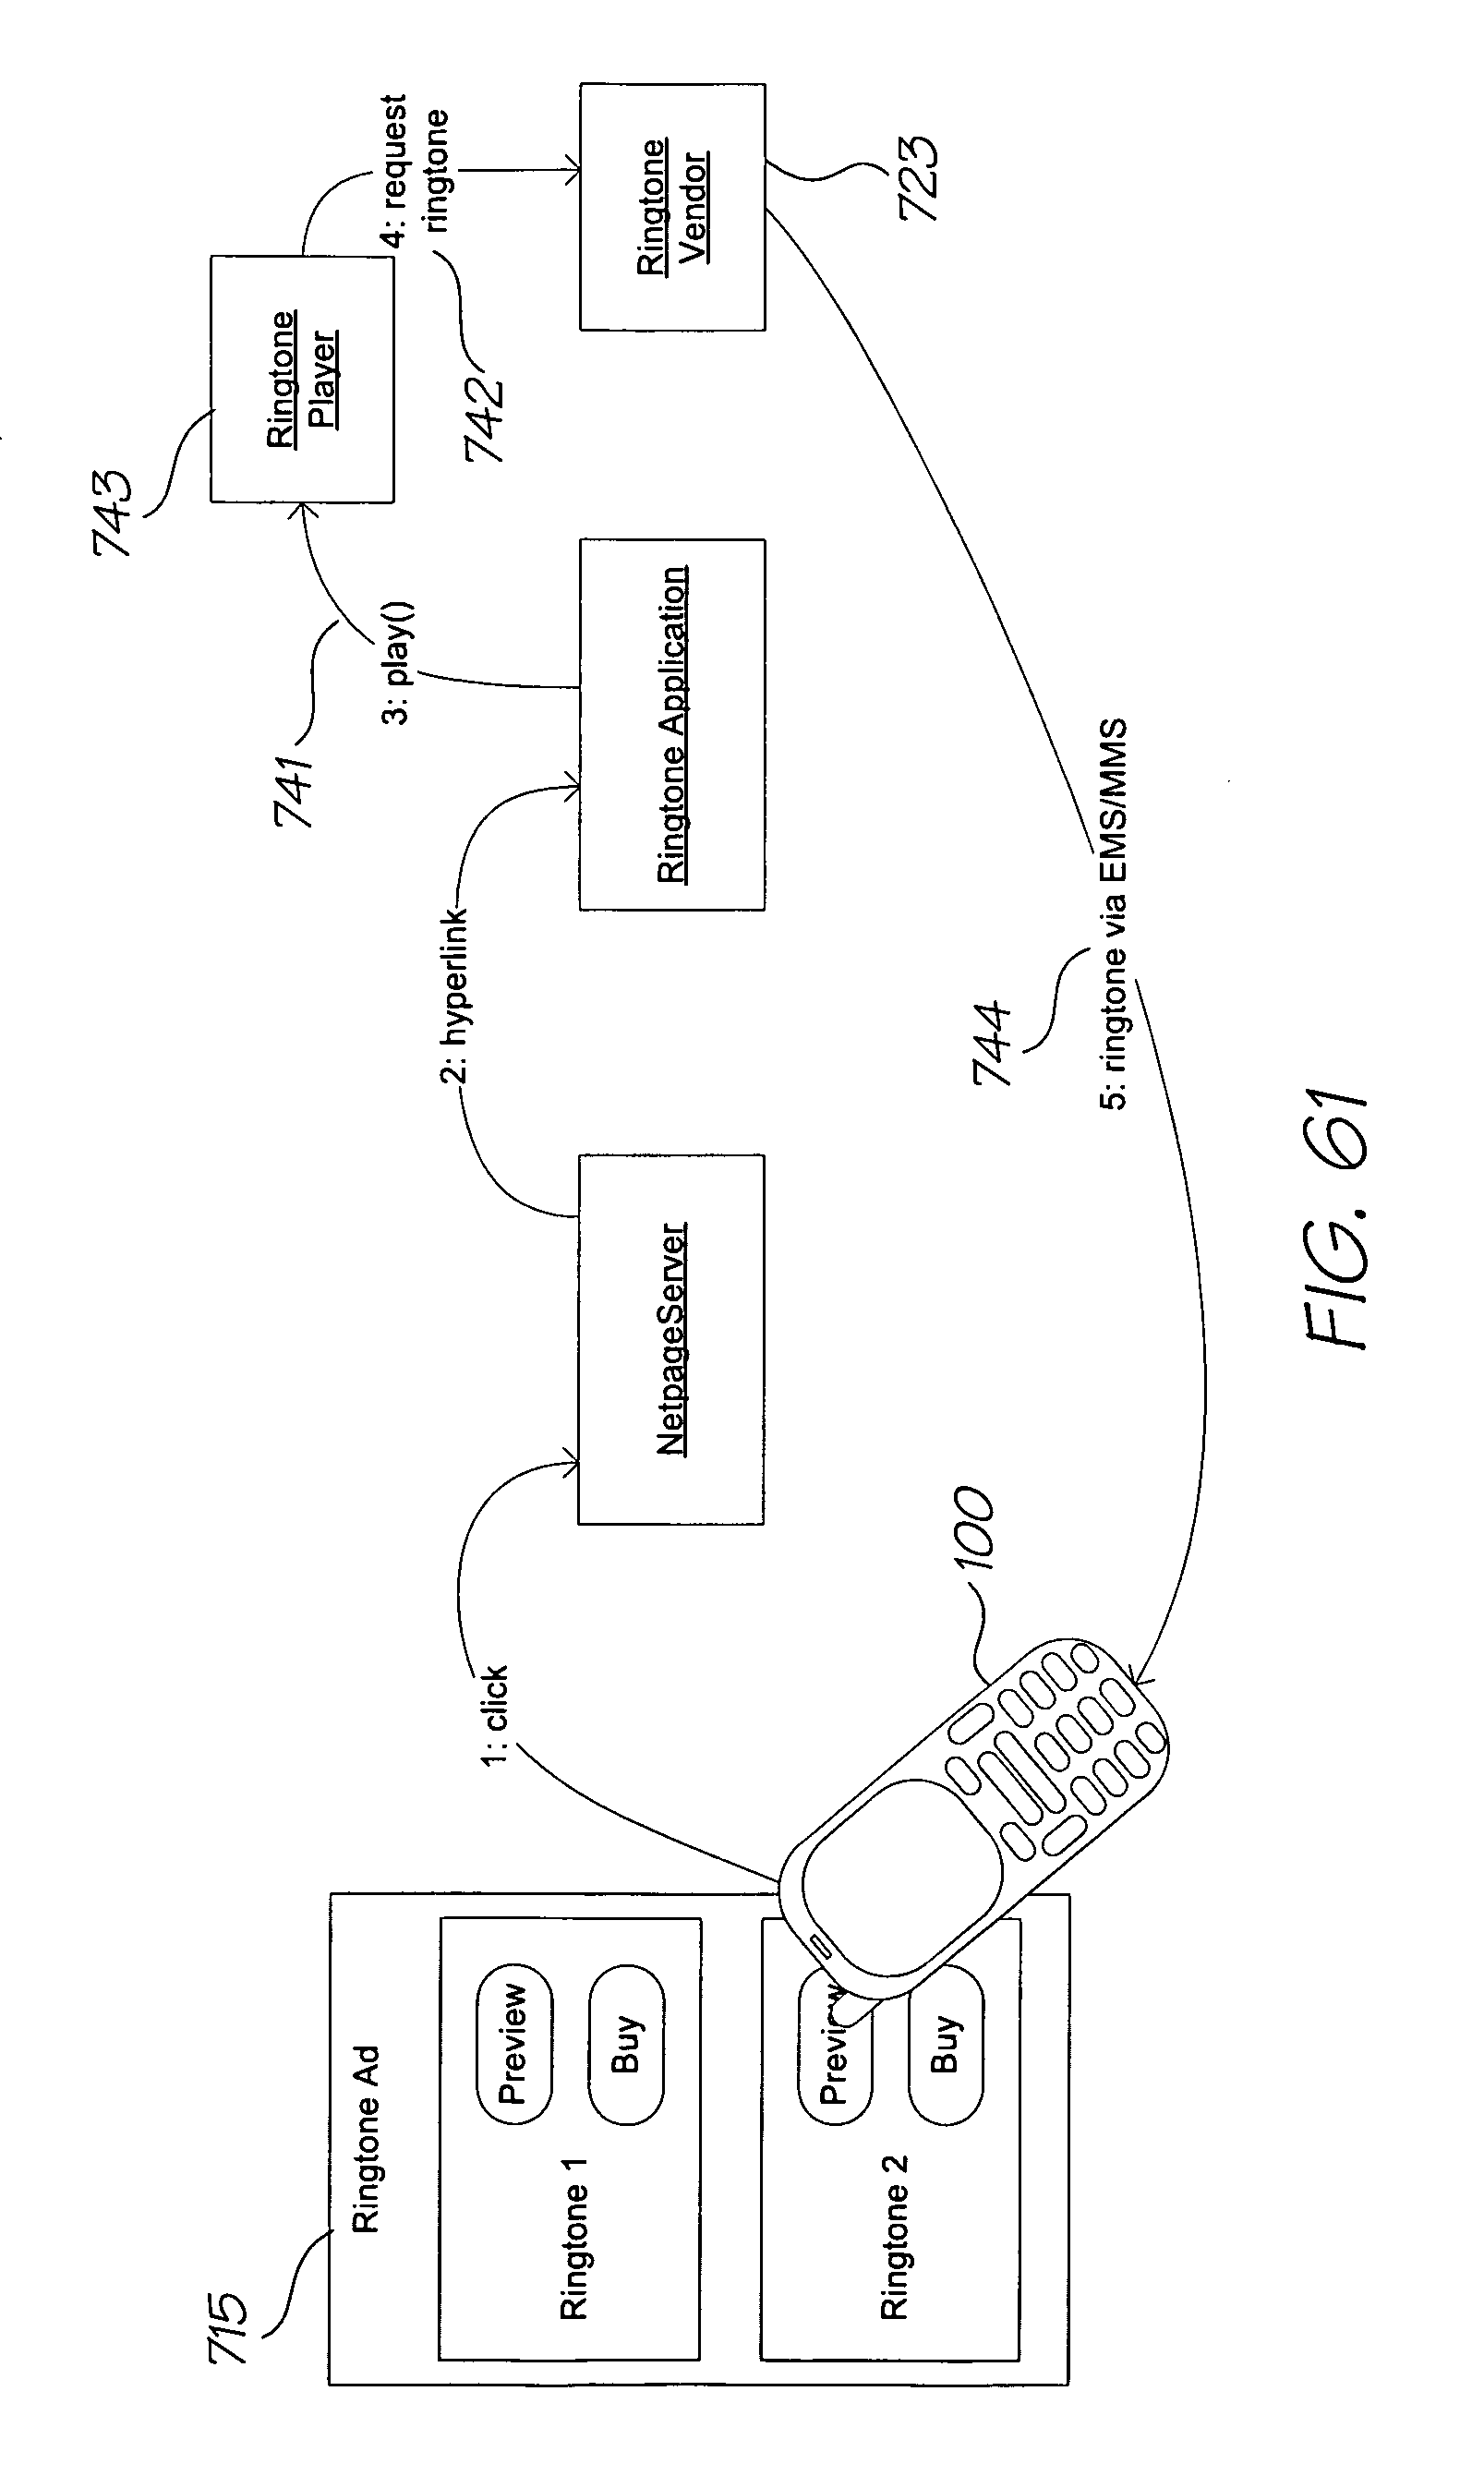 patent us 7 991 493 b2